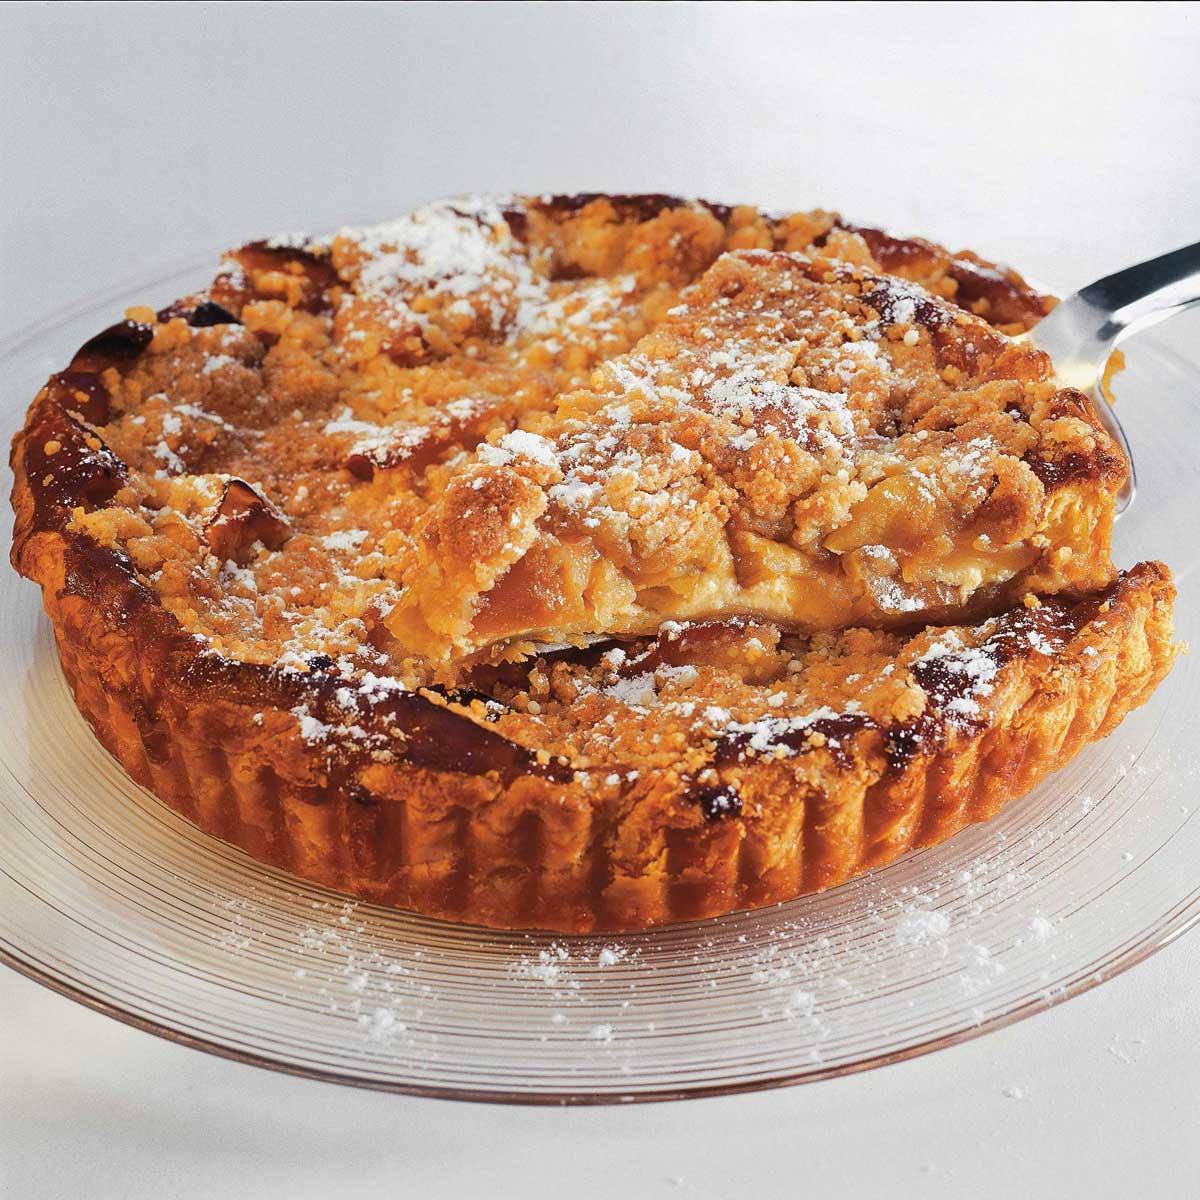 Recette tarte grand m re l 39 ancienne cuisine madame figaro - Recette cuisine ancienne ...